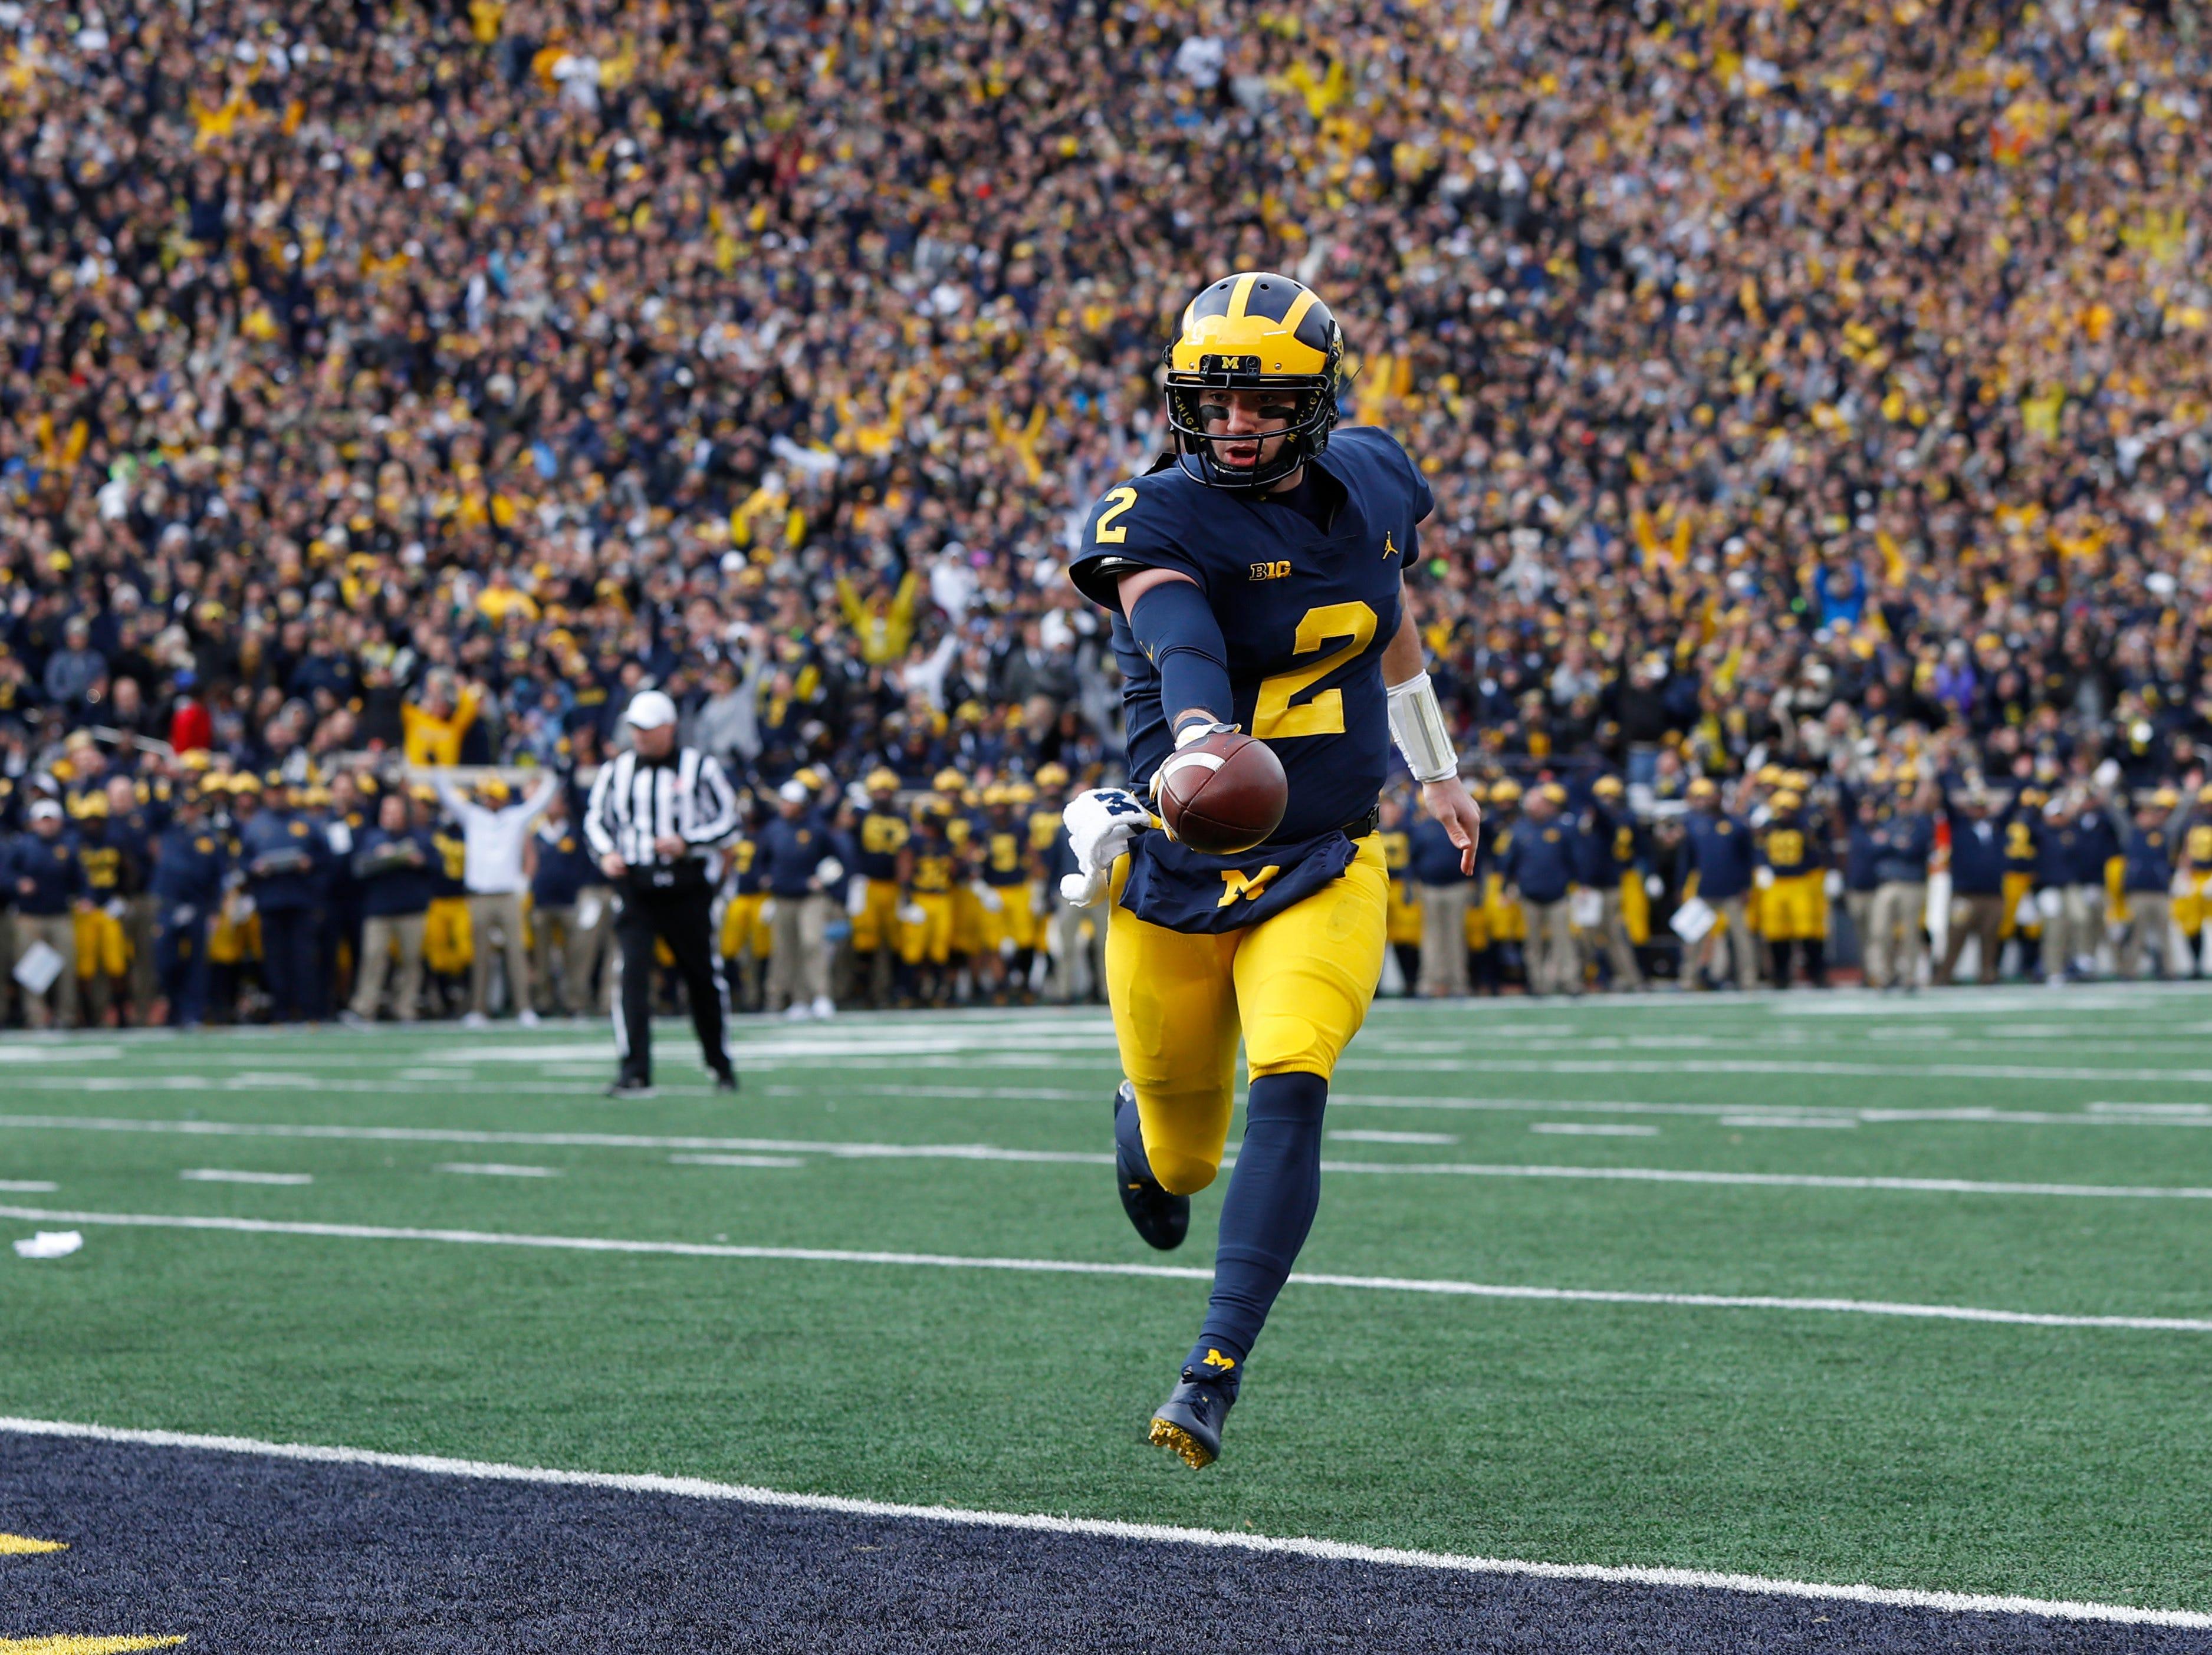 Michigan quarterback Shea Patterson runs for a one-yard touchdown against Penn State in the first half of an NCAA college football game in Ann Arbor, Mich., Saturday, Nov. 3, 2018. (AP Photo/Paul Sancya)